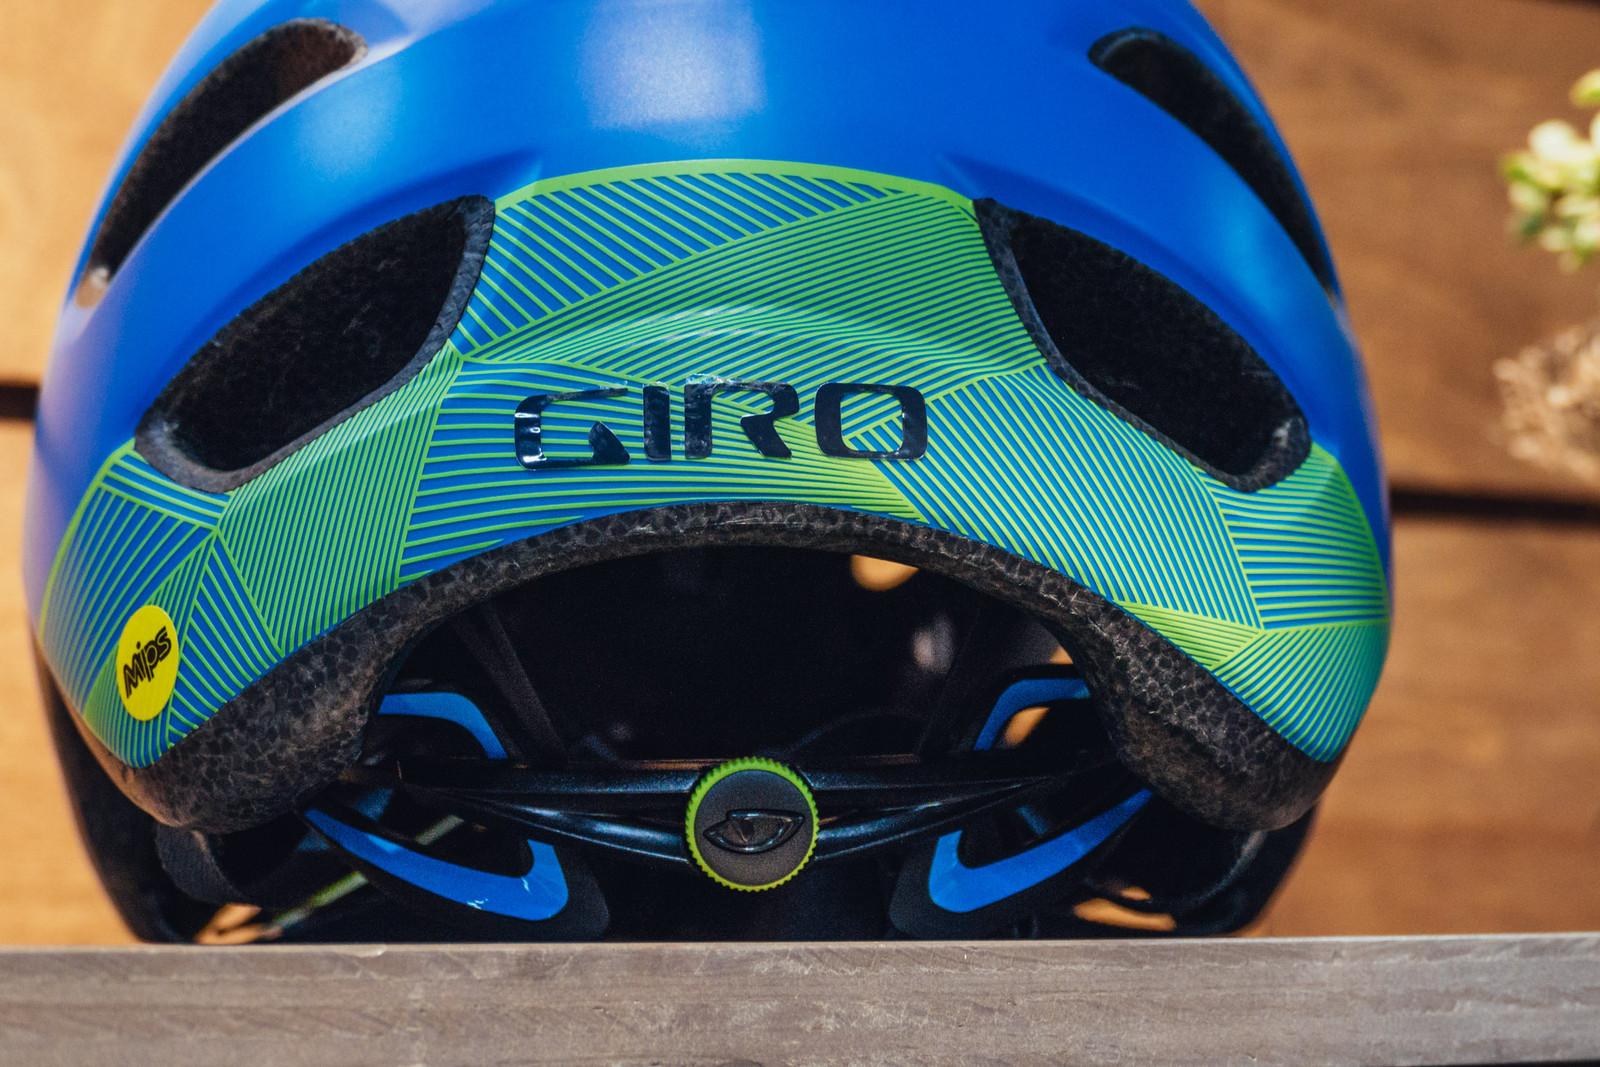 Giro Bike Helmets >> Giro Chronicle MIPS Helmet - INTERBIKE - 2017 Mountain Bike Apparel and Protective Gear ...